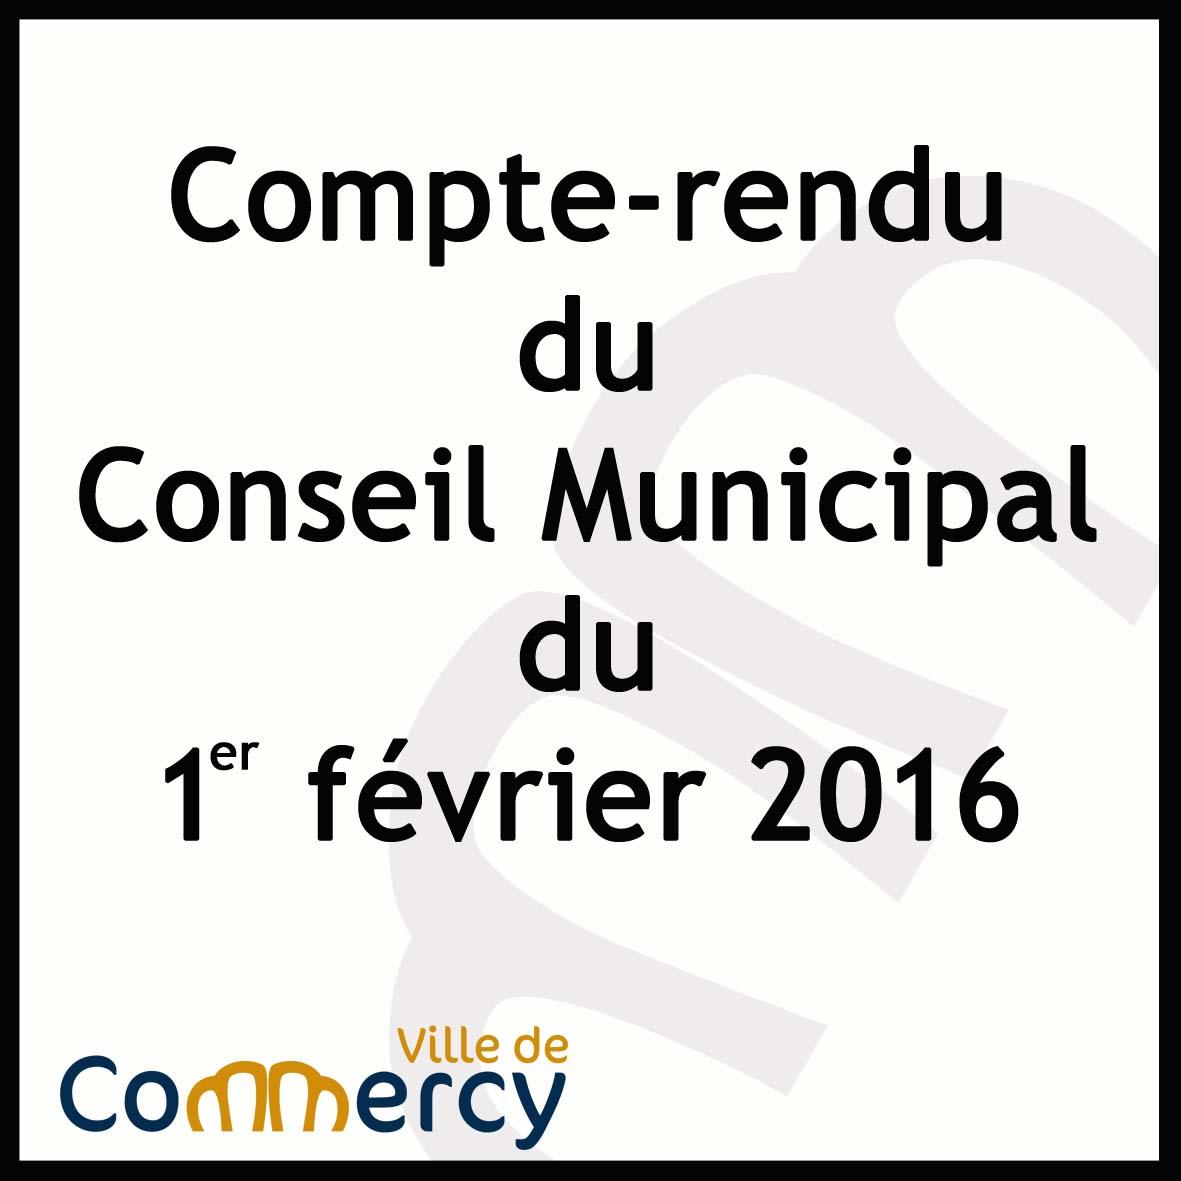 CRCM_20160201